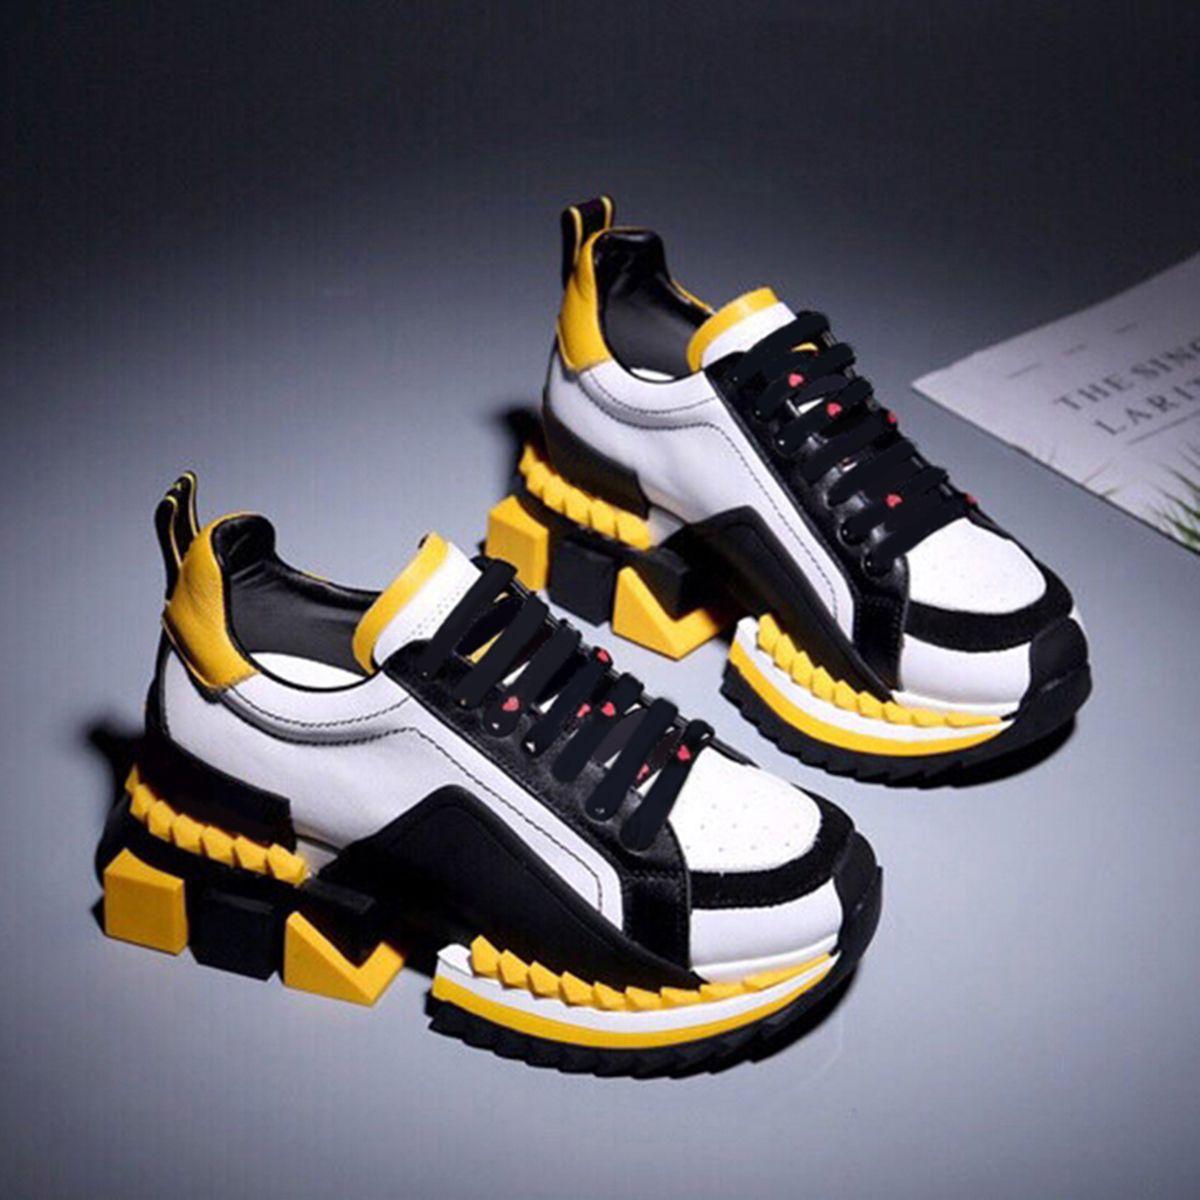 2020 Top mode chaussures de sport Chaussures de sport New Chaussures de sport hommes et femmes fond épais Couleur sauvage Matching Noir Taille US6-10